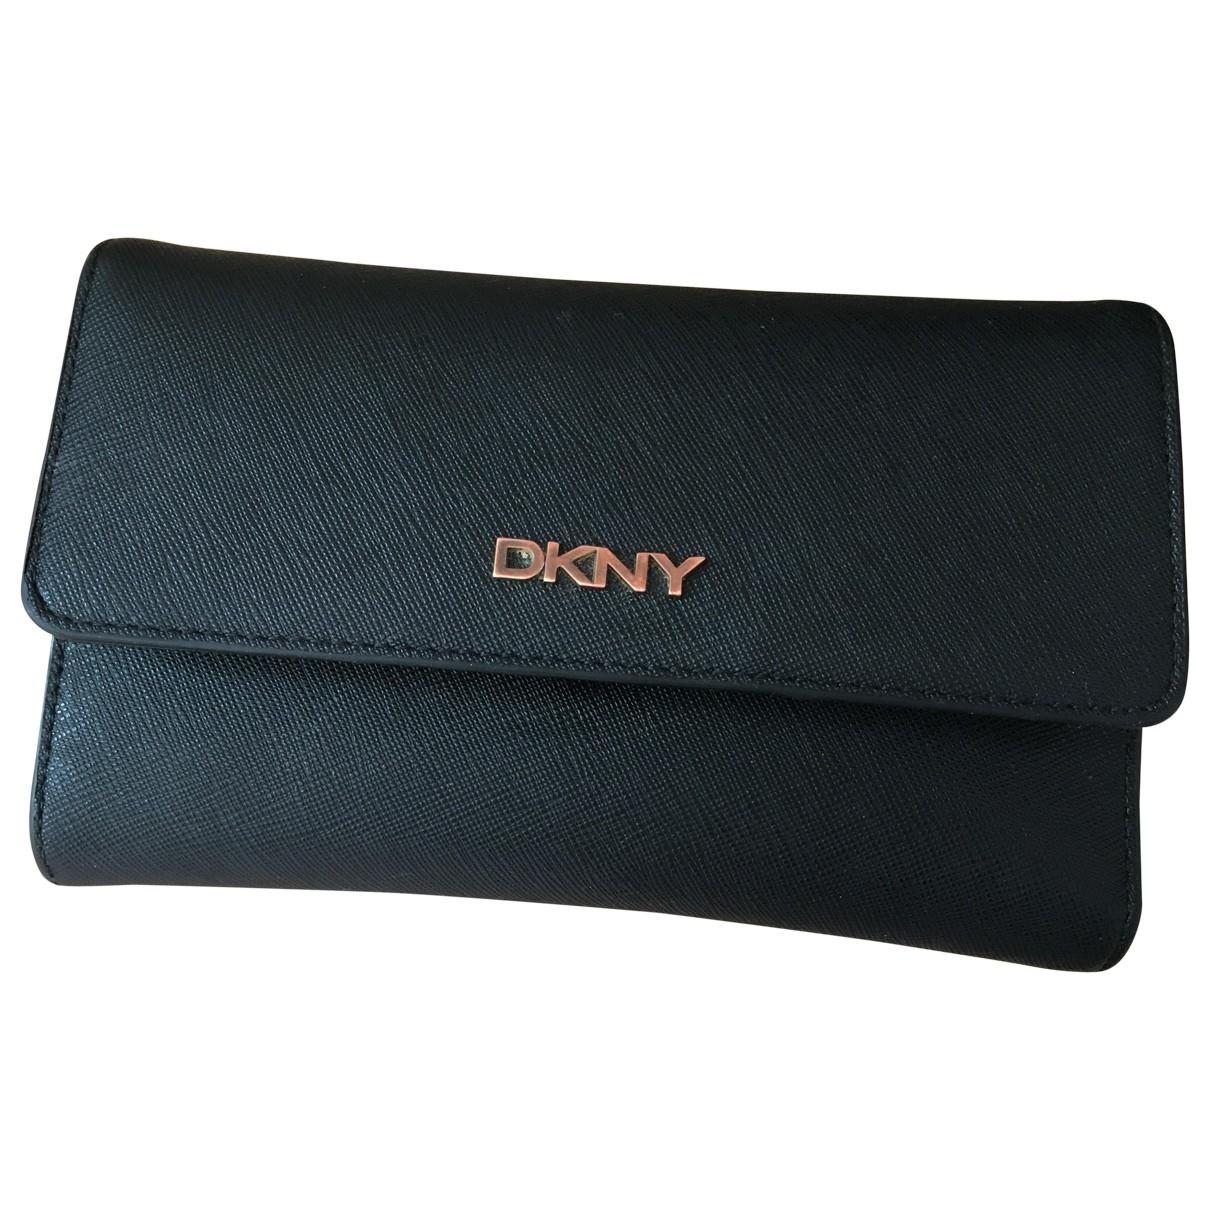 Dkny \N Black Cloth wallet for Women \N